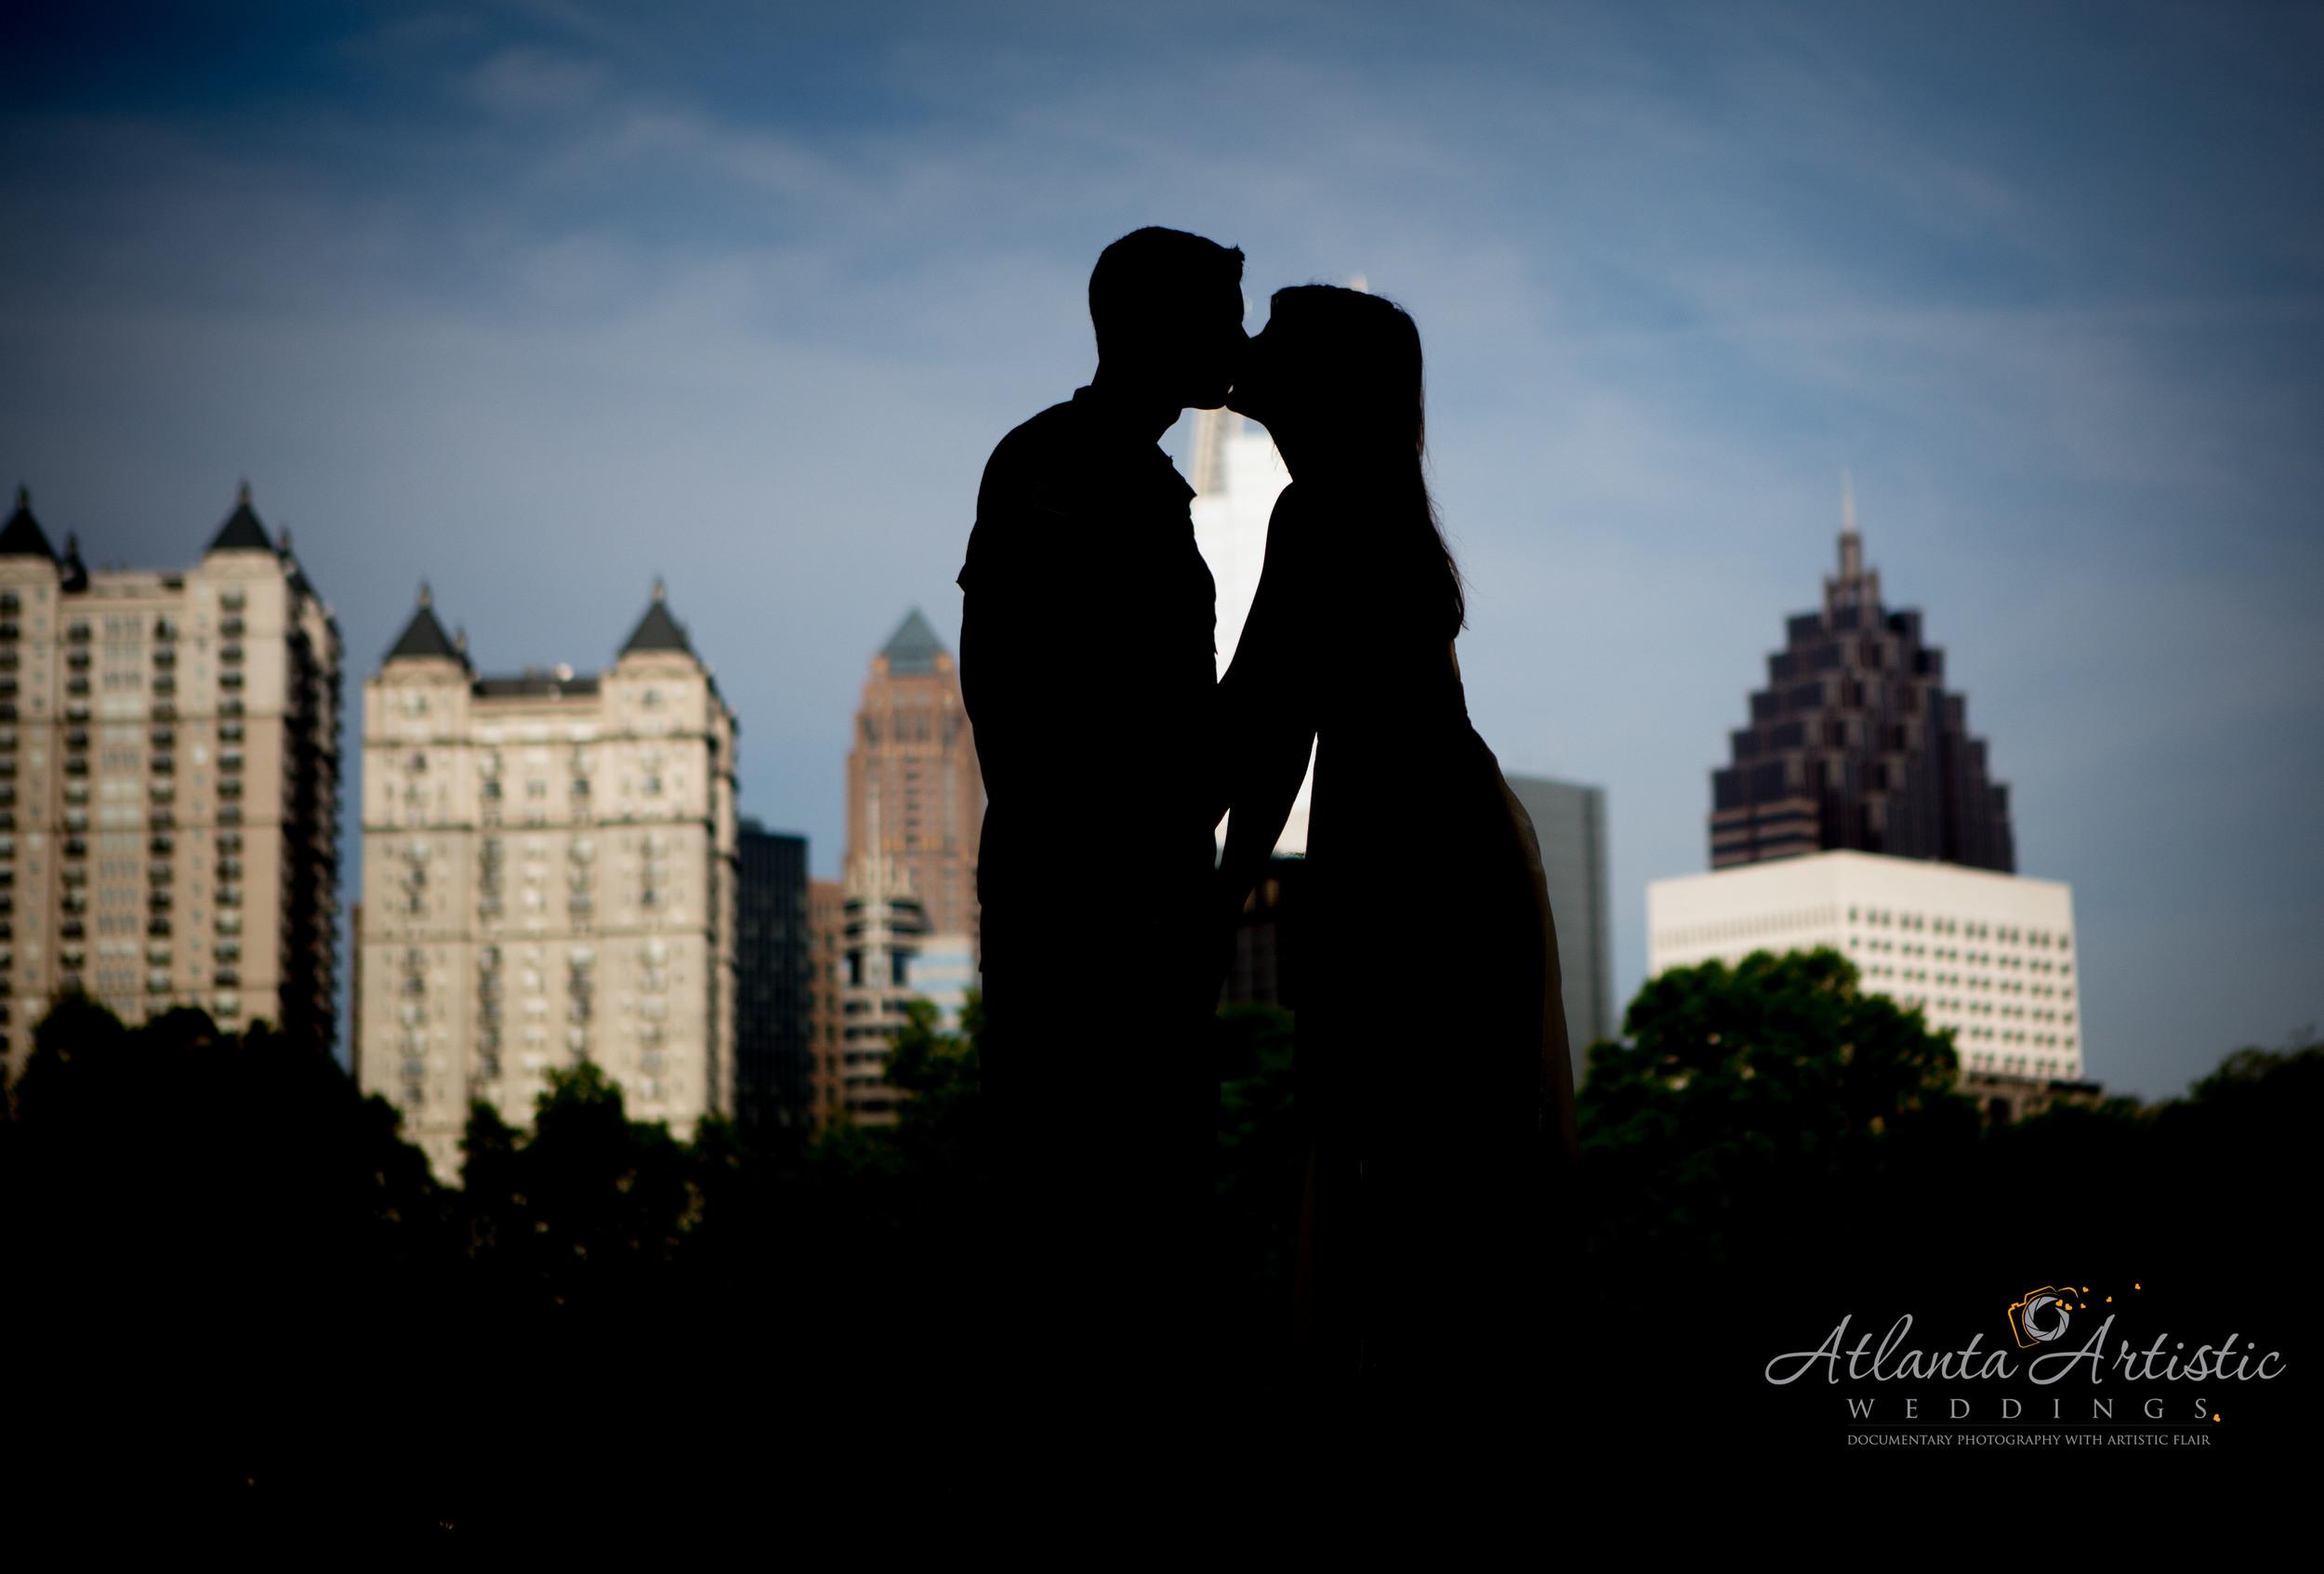 Photo locations in Atlanta by wedding photographers at  www.atlantaartisticweddings.com